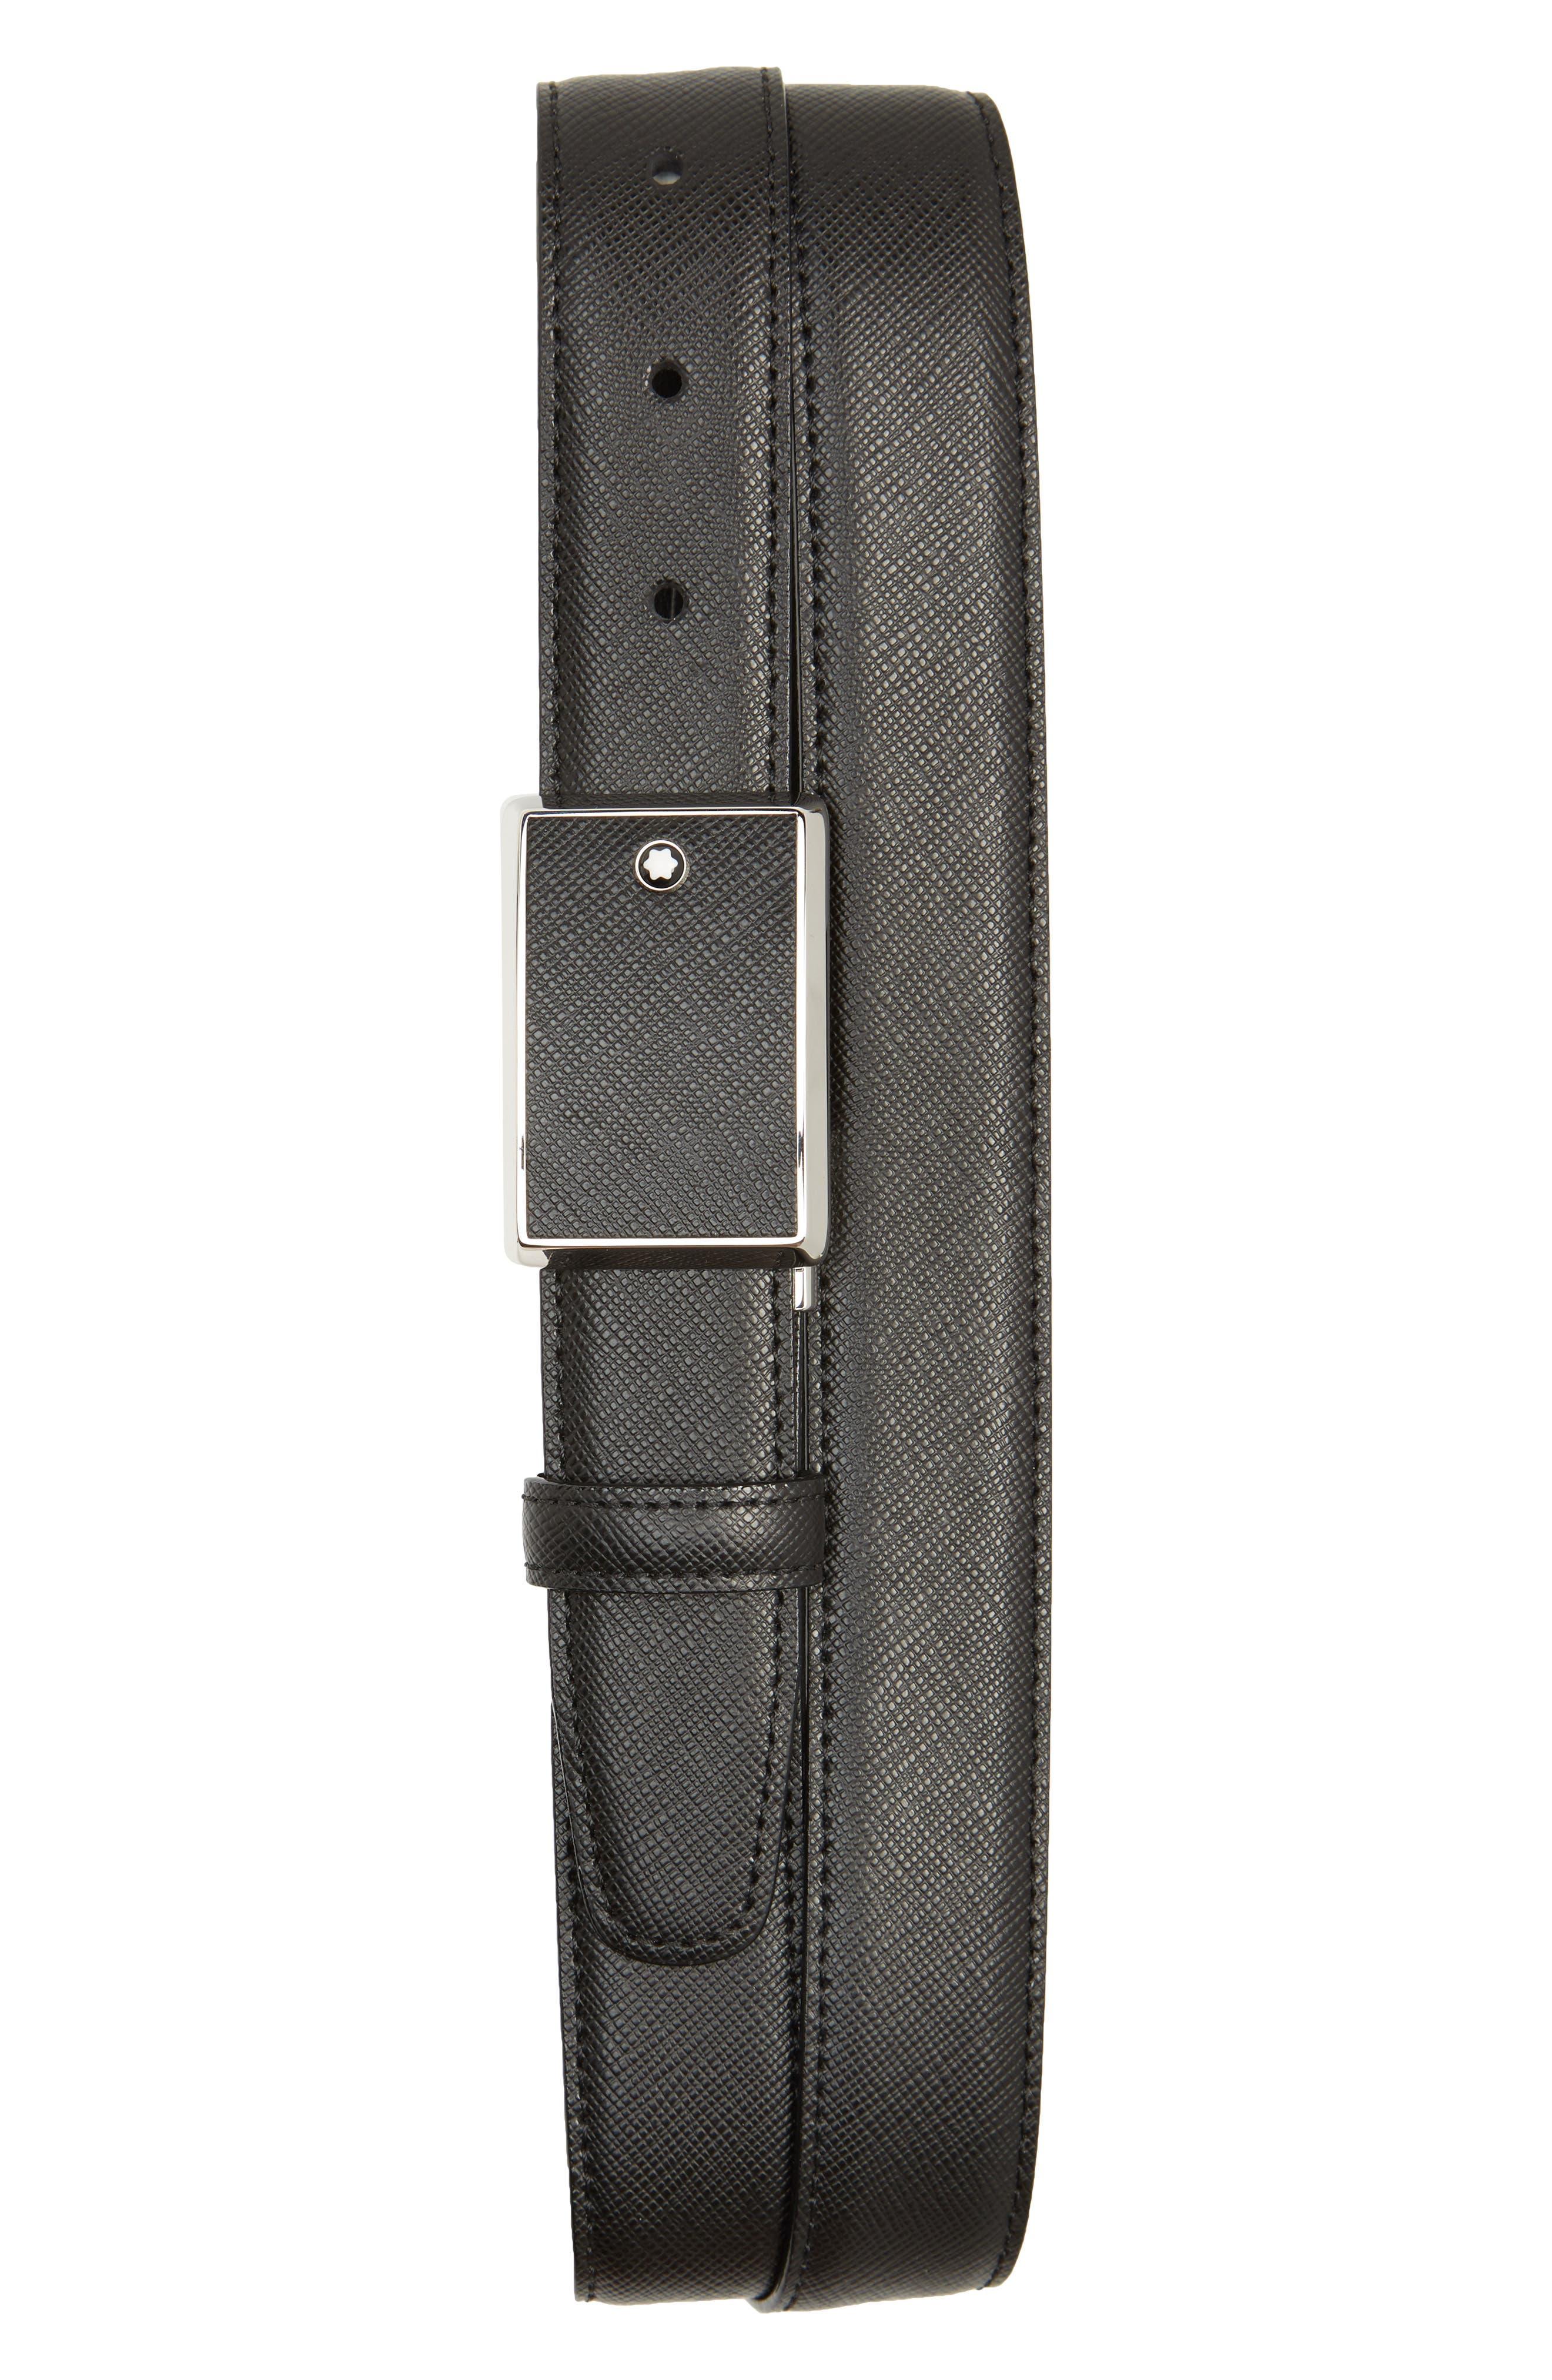 MONTBLANC, Meisterstuck Reversible Sartorial Leather Belt, Main thumbnail 1, color, BLACK